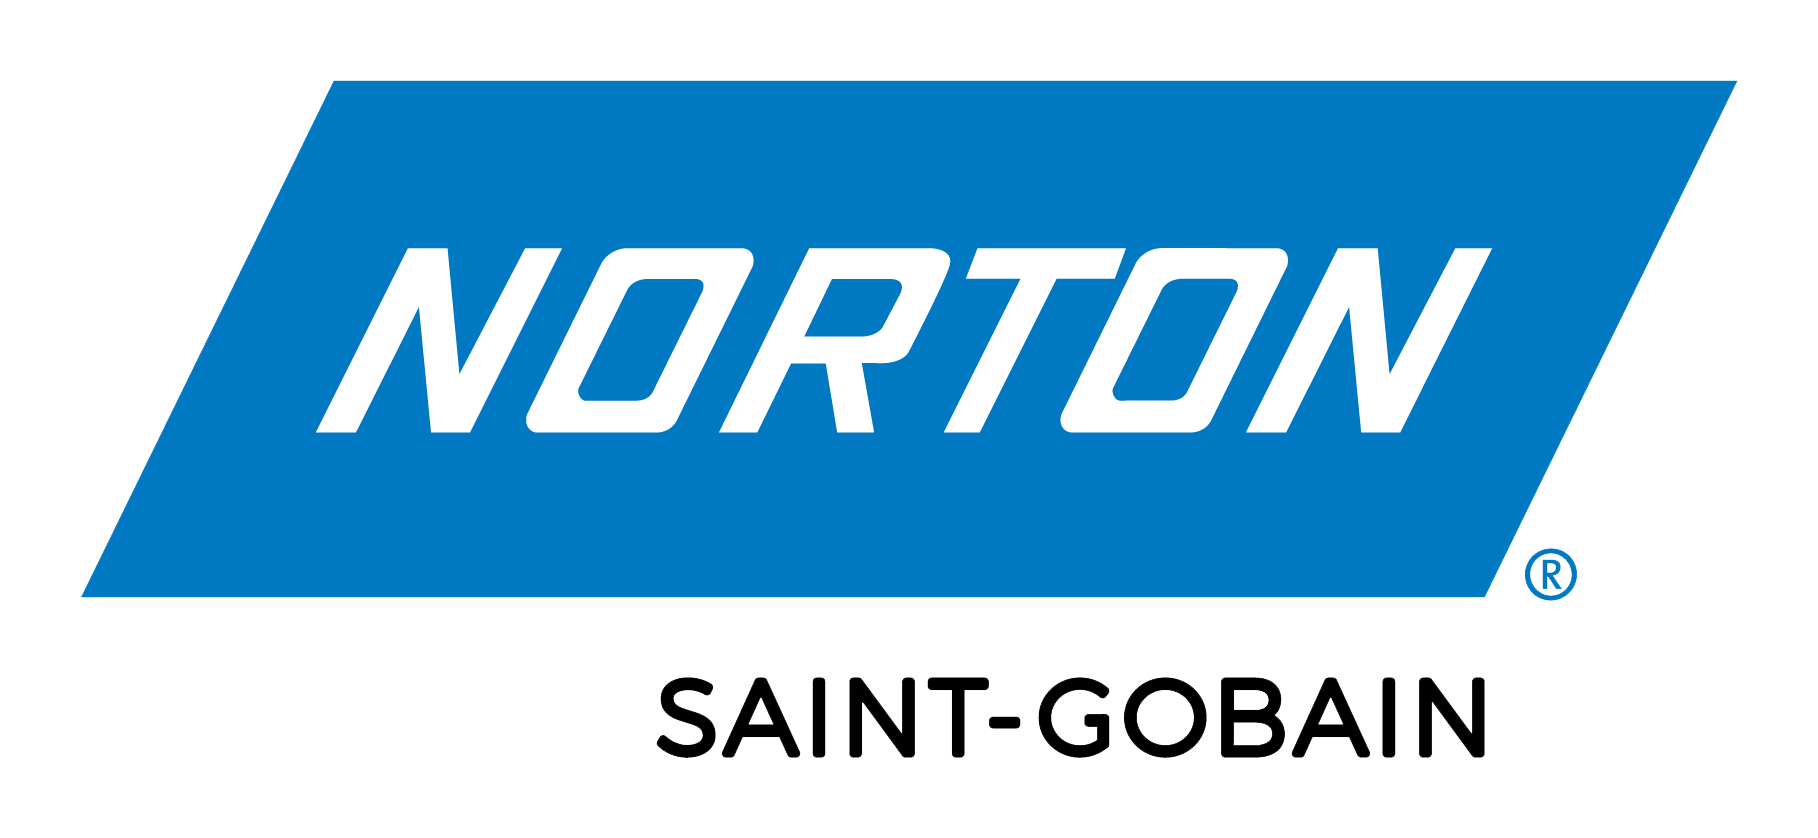 SG_Norton_logo_rgb_18